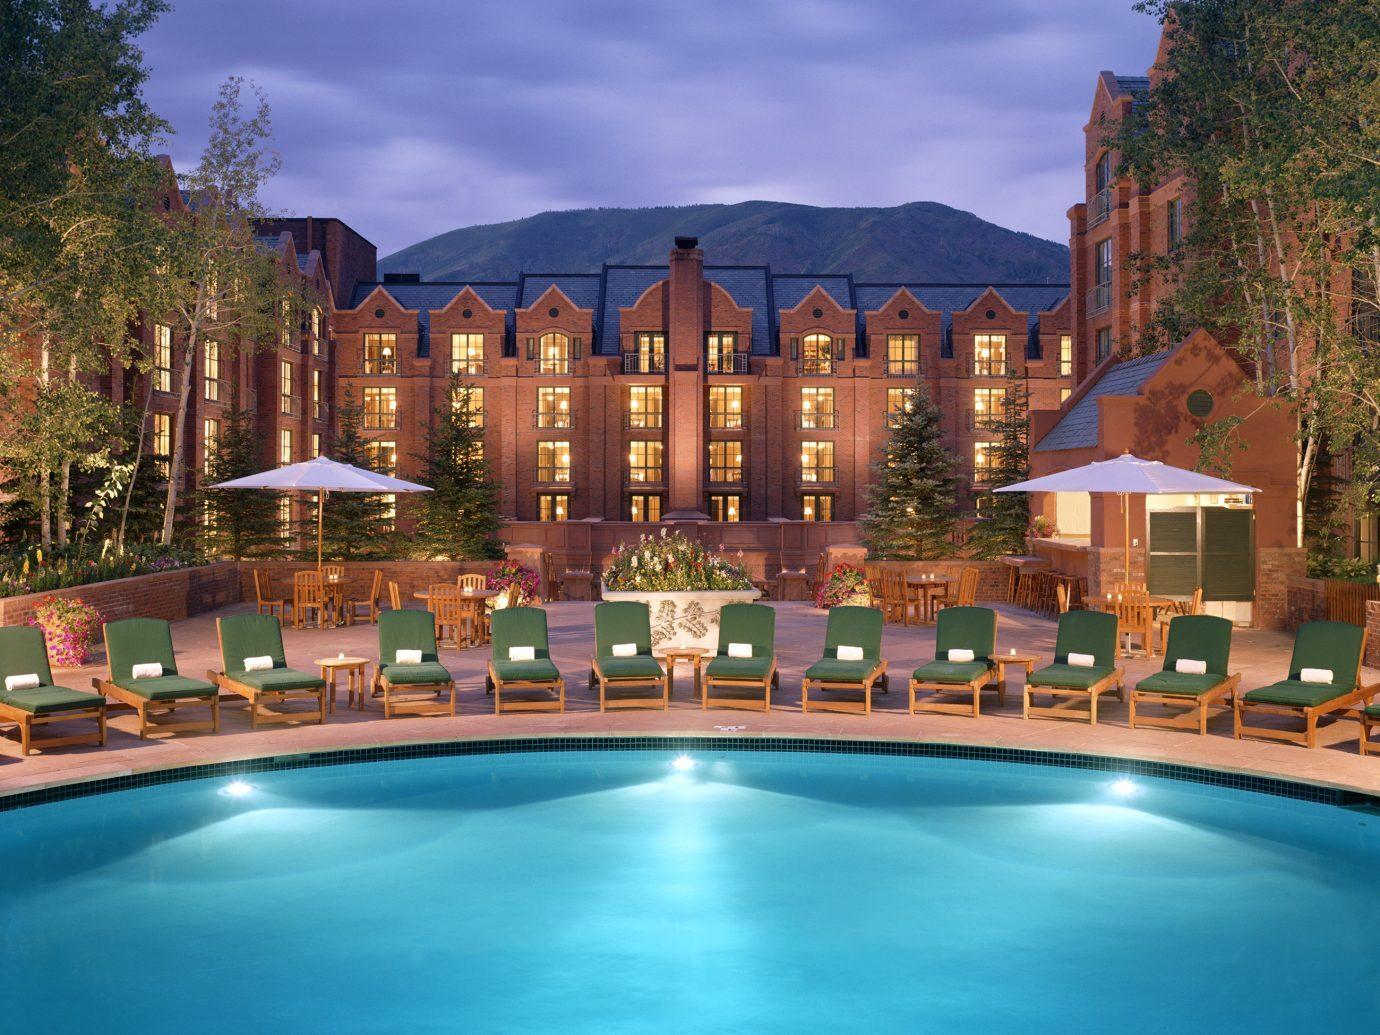 Pool at The St. Regis Aspen Resort